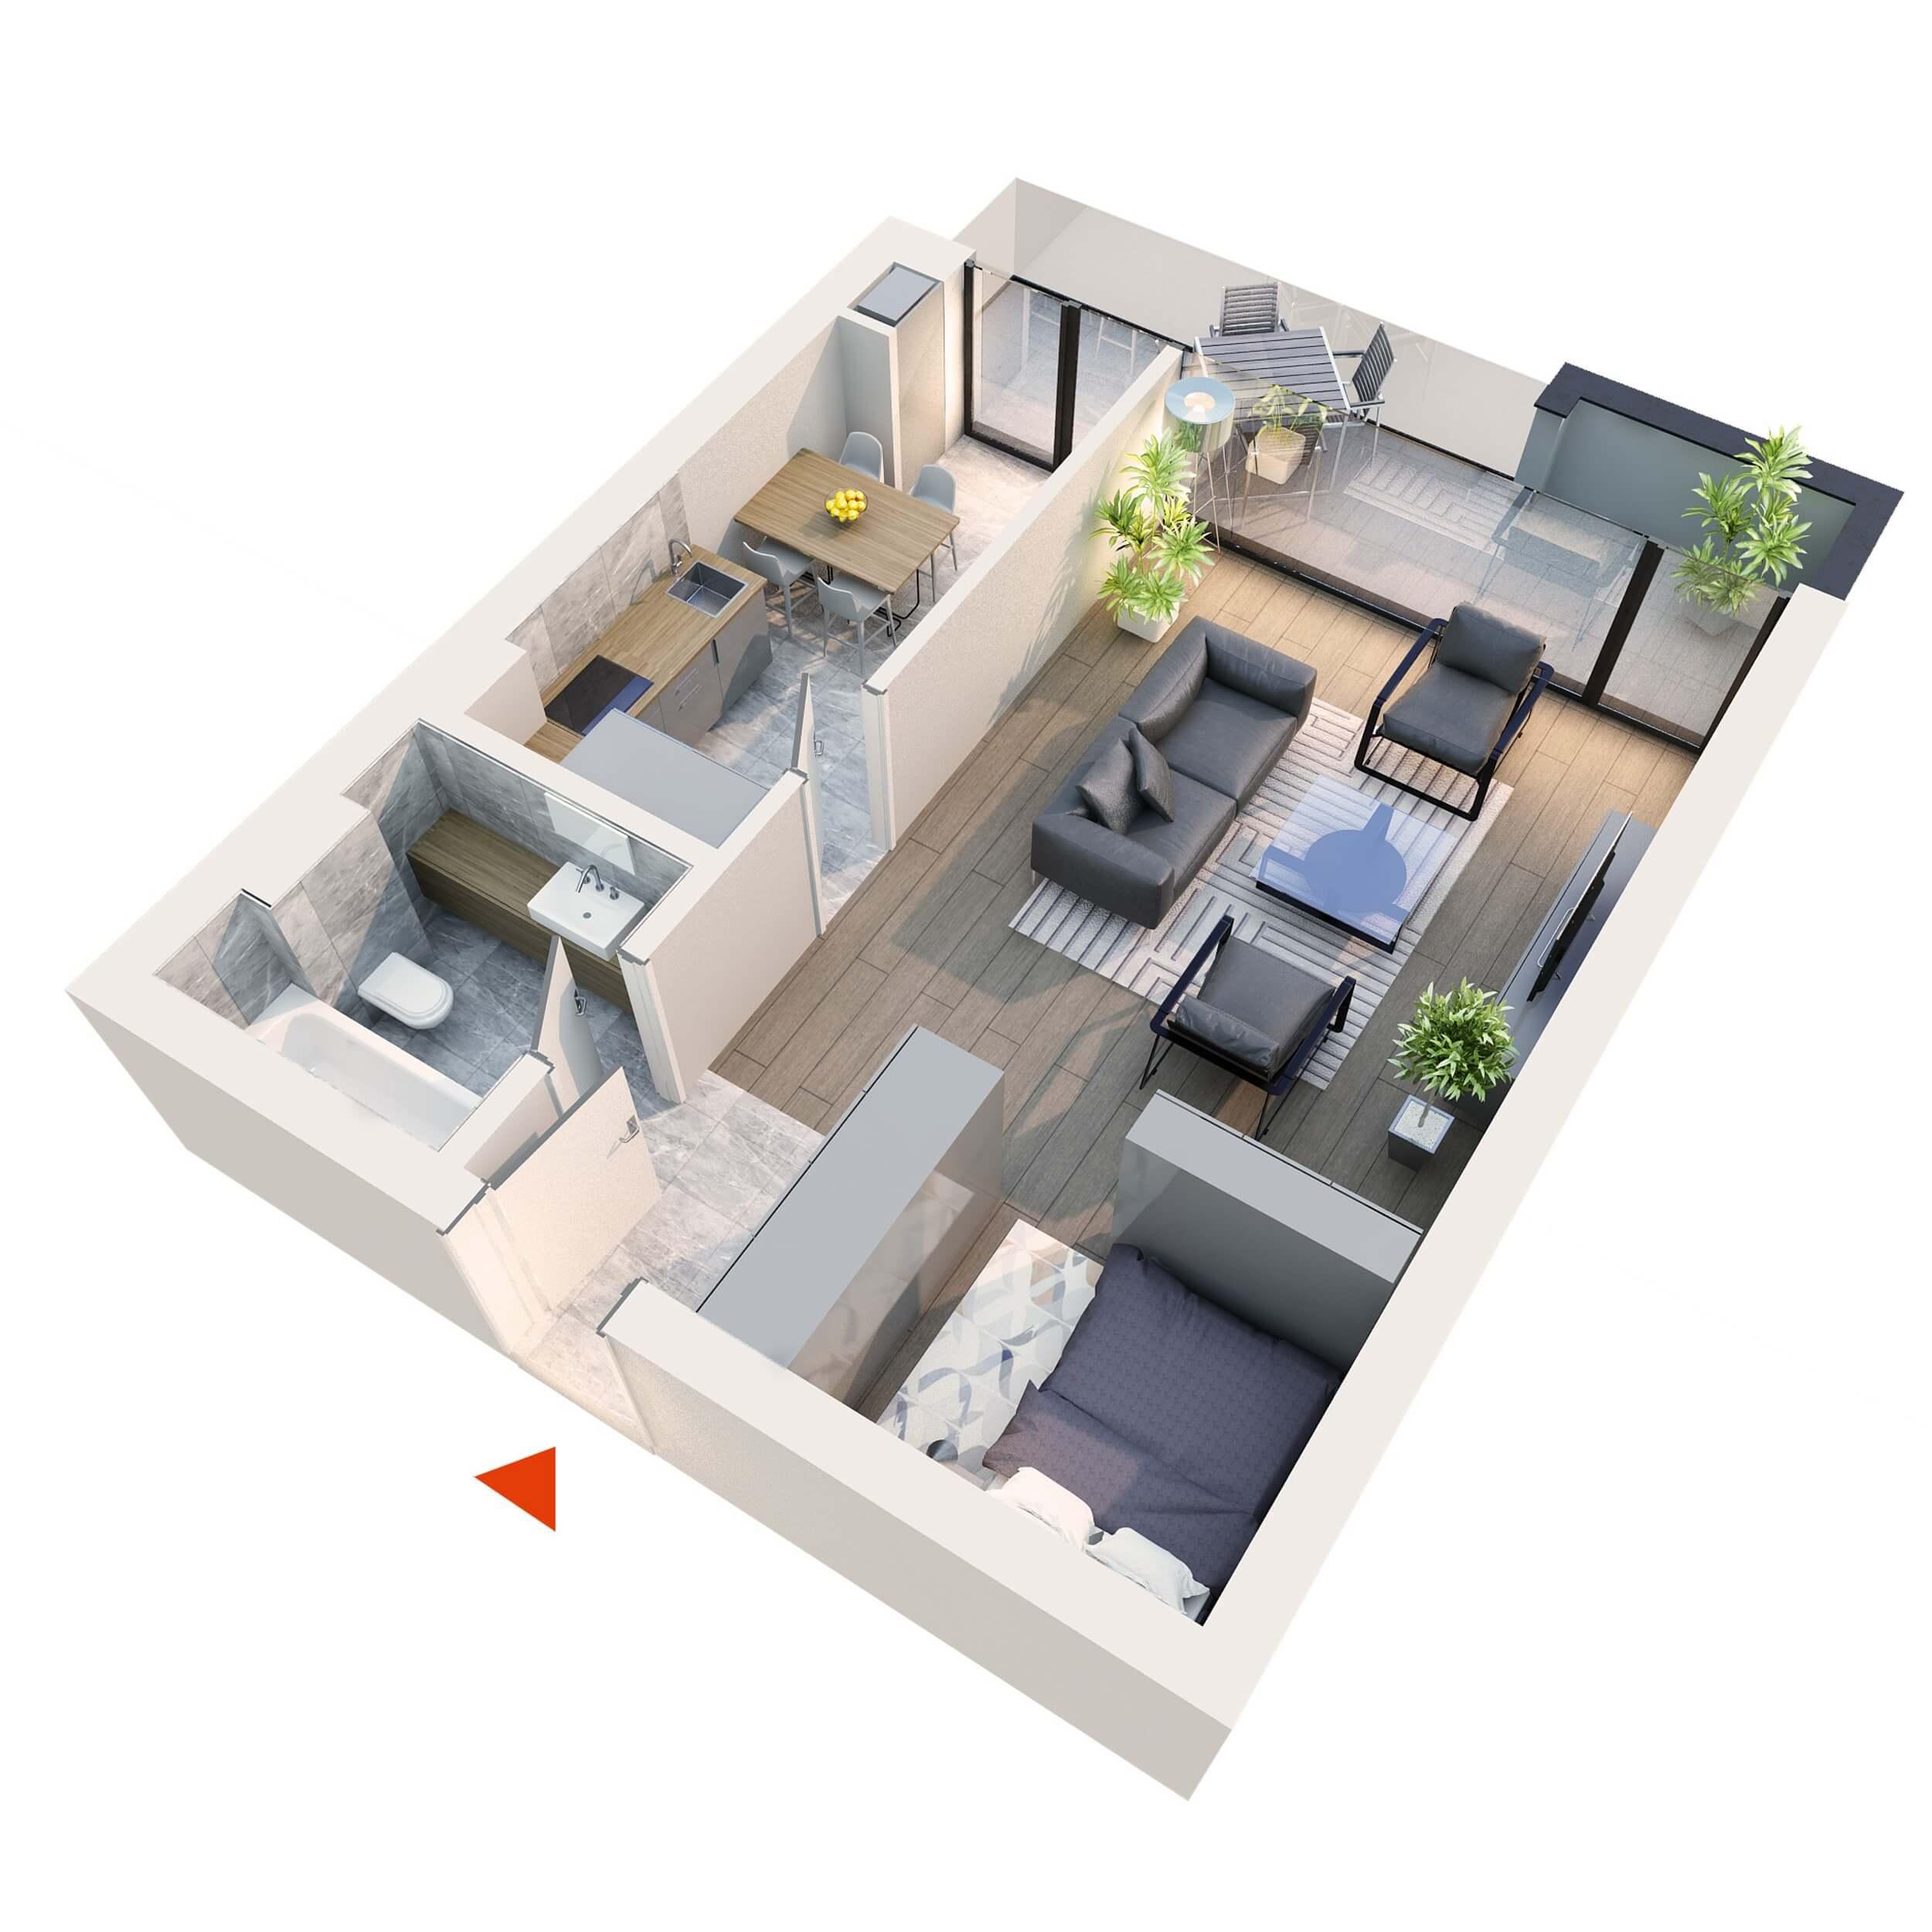 Apartament Studio tip 1F1´ | Balcon | Etaj 6 | Corp C7 C8 | Faza 2